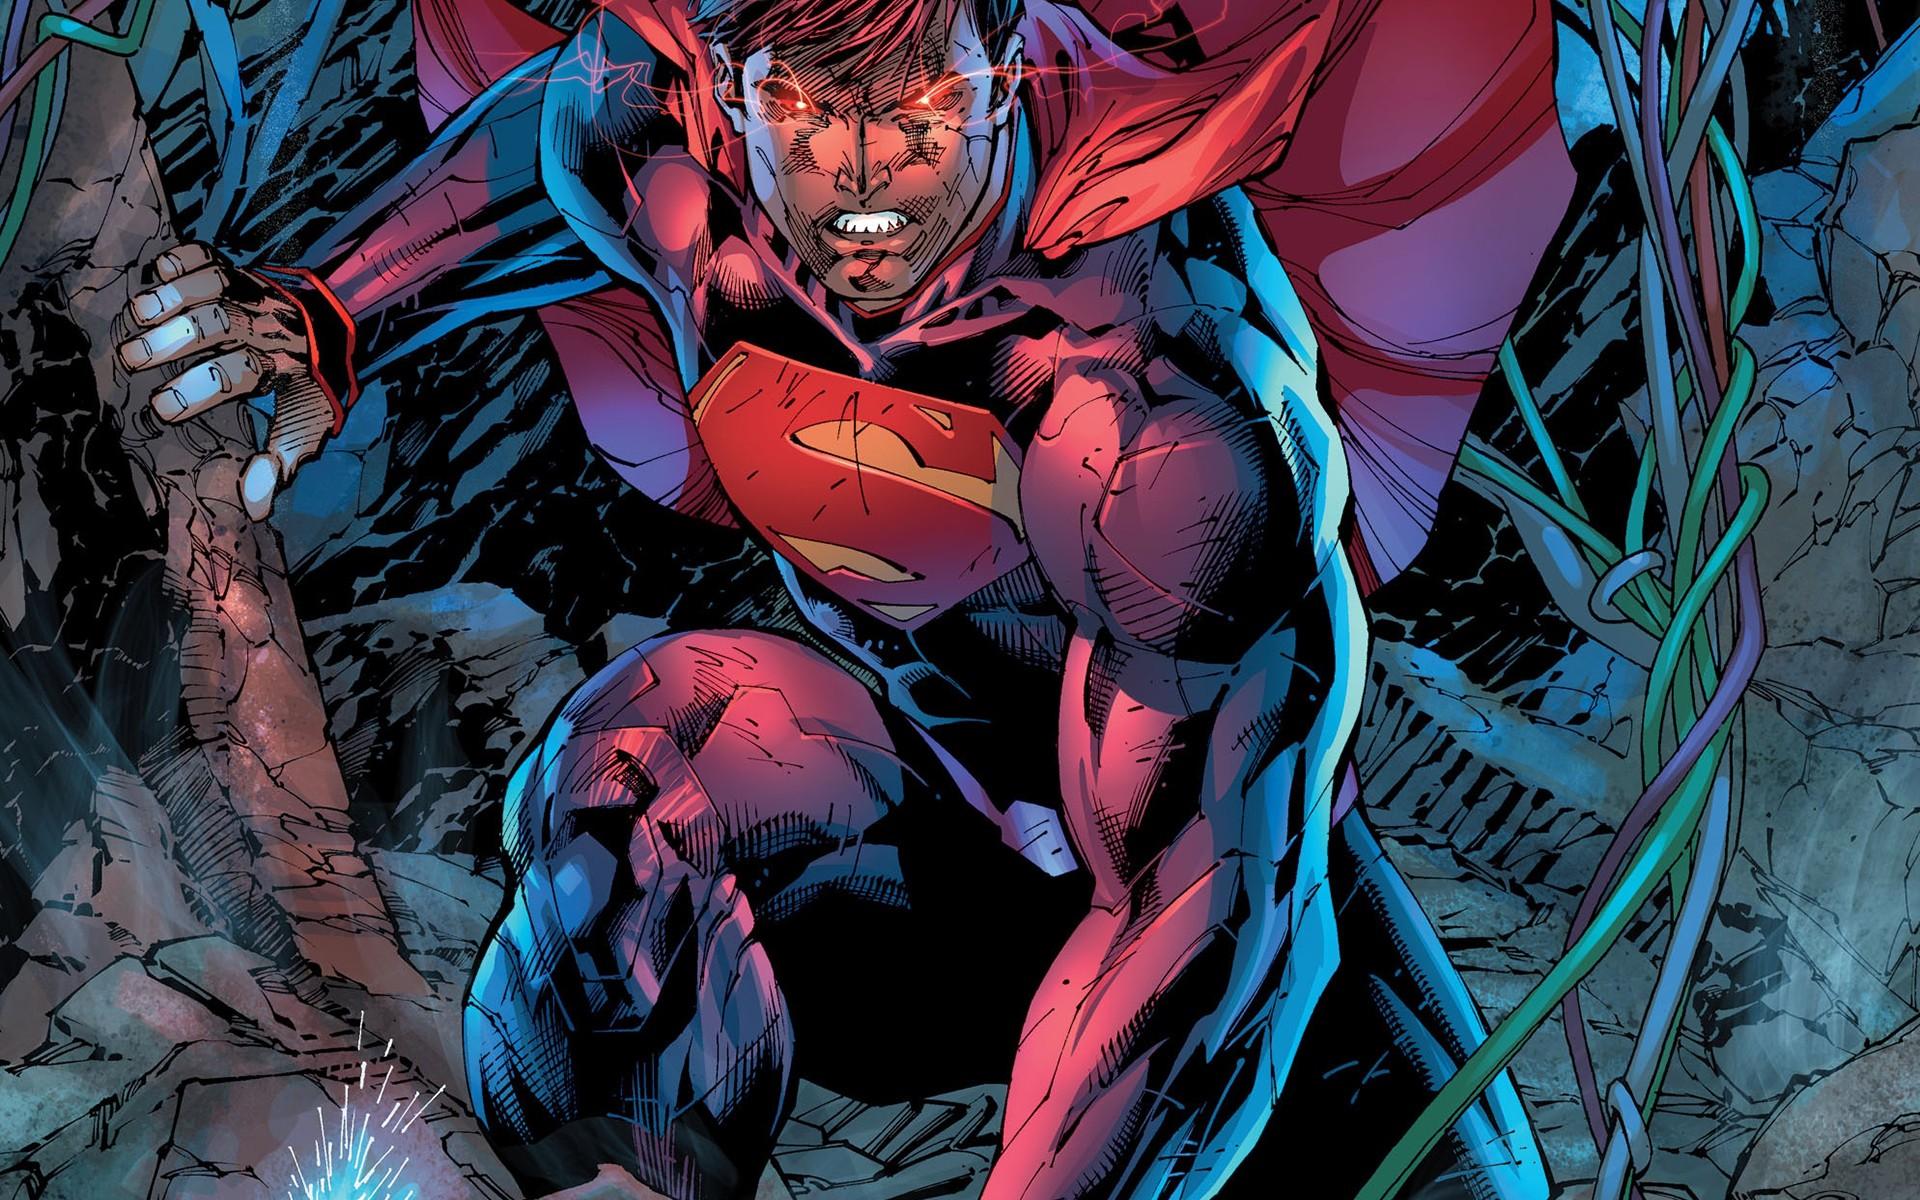 1920x1200 Px DC Comics Man Of Steel Superman